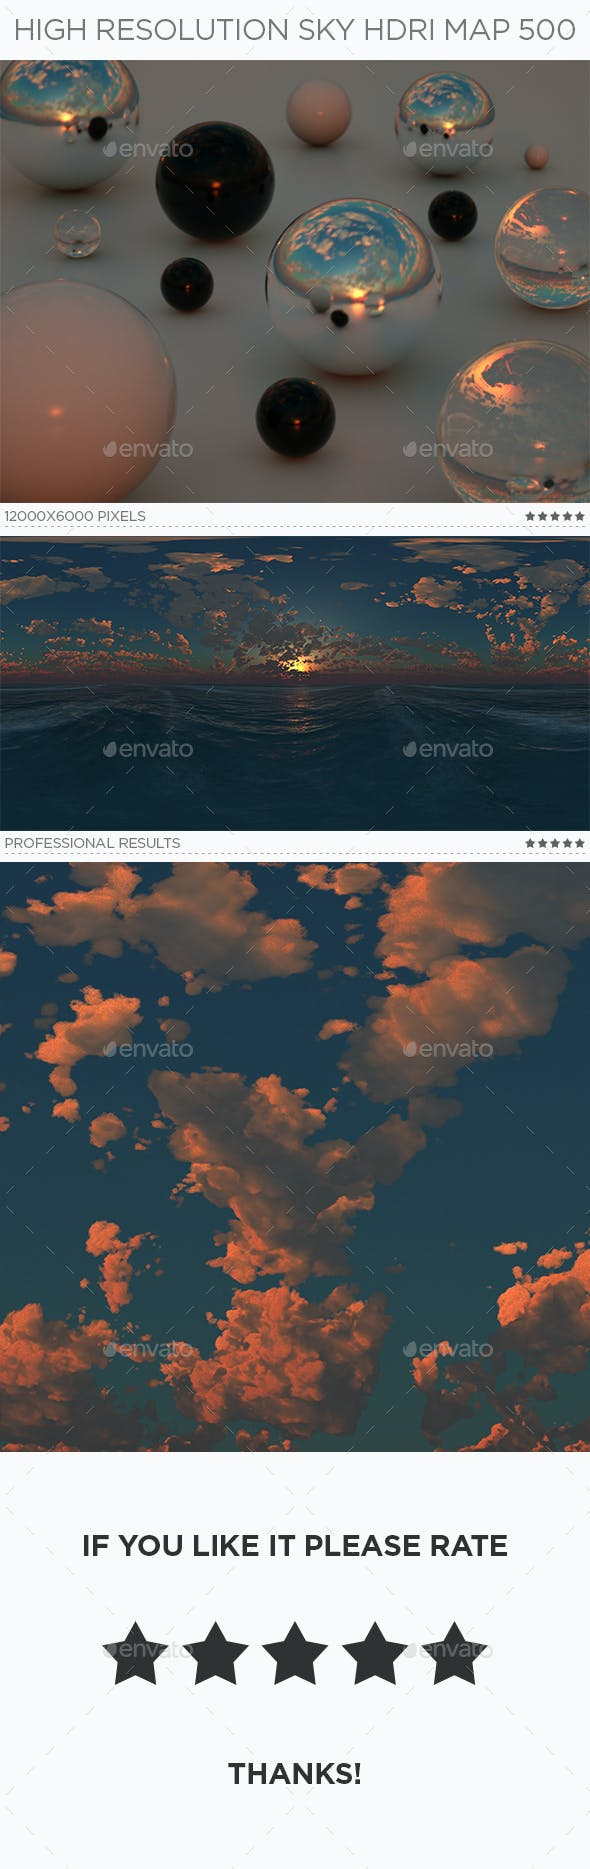 High Resolution Sky HDRi Map 500 - 3DOcean Item for Sale